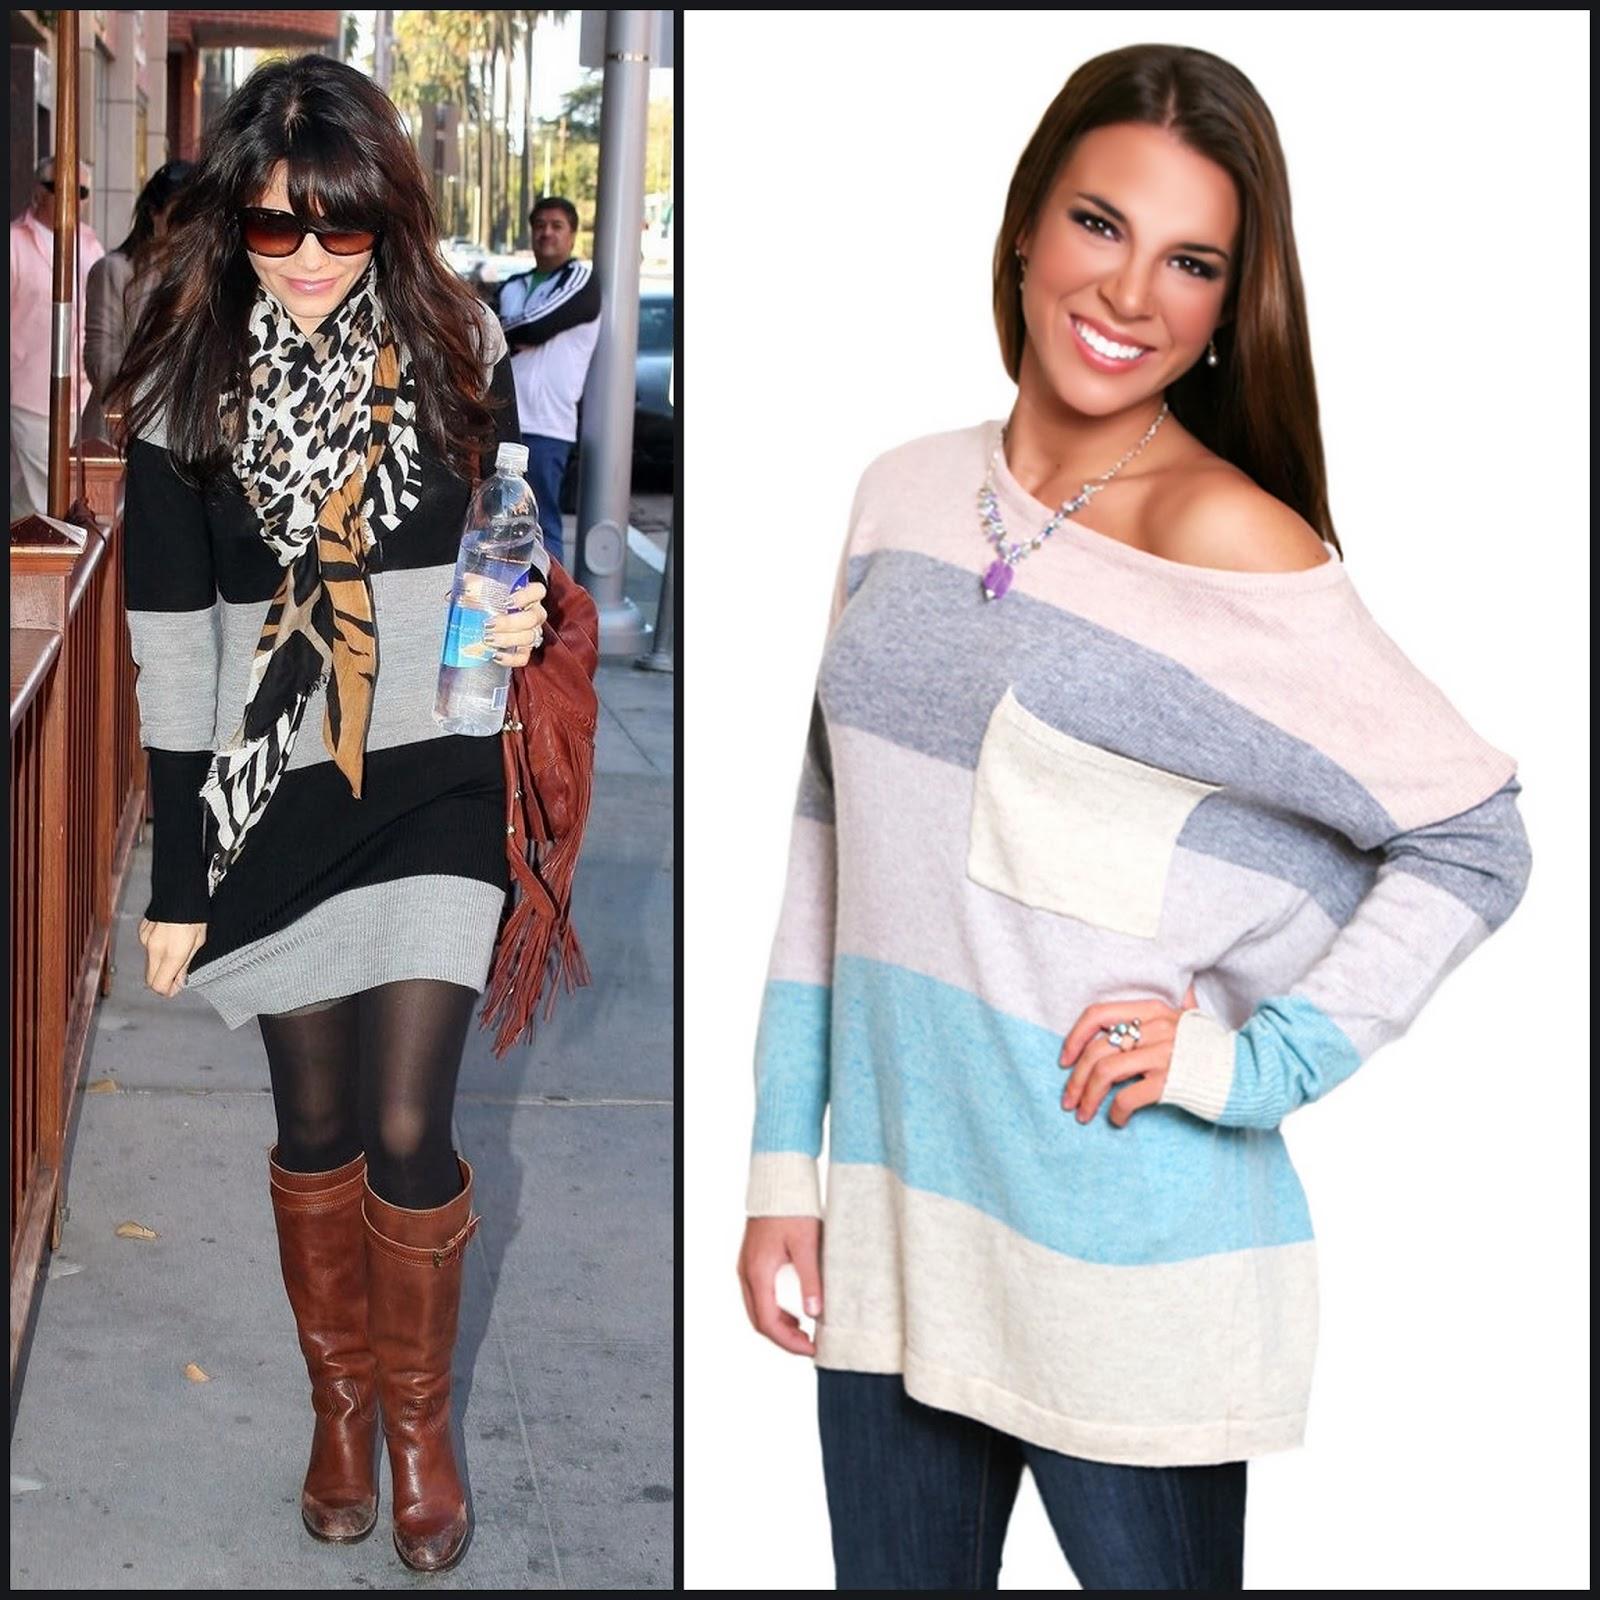 Jenna Dewan Tatum Style Slouchy Sweater